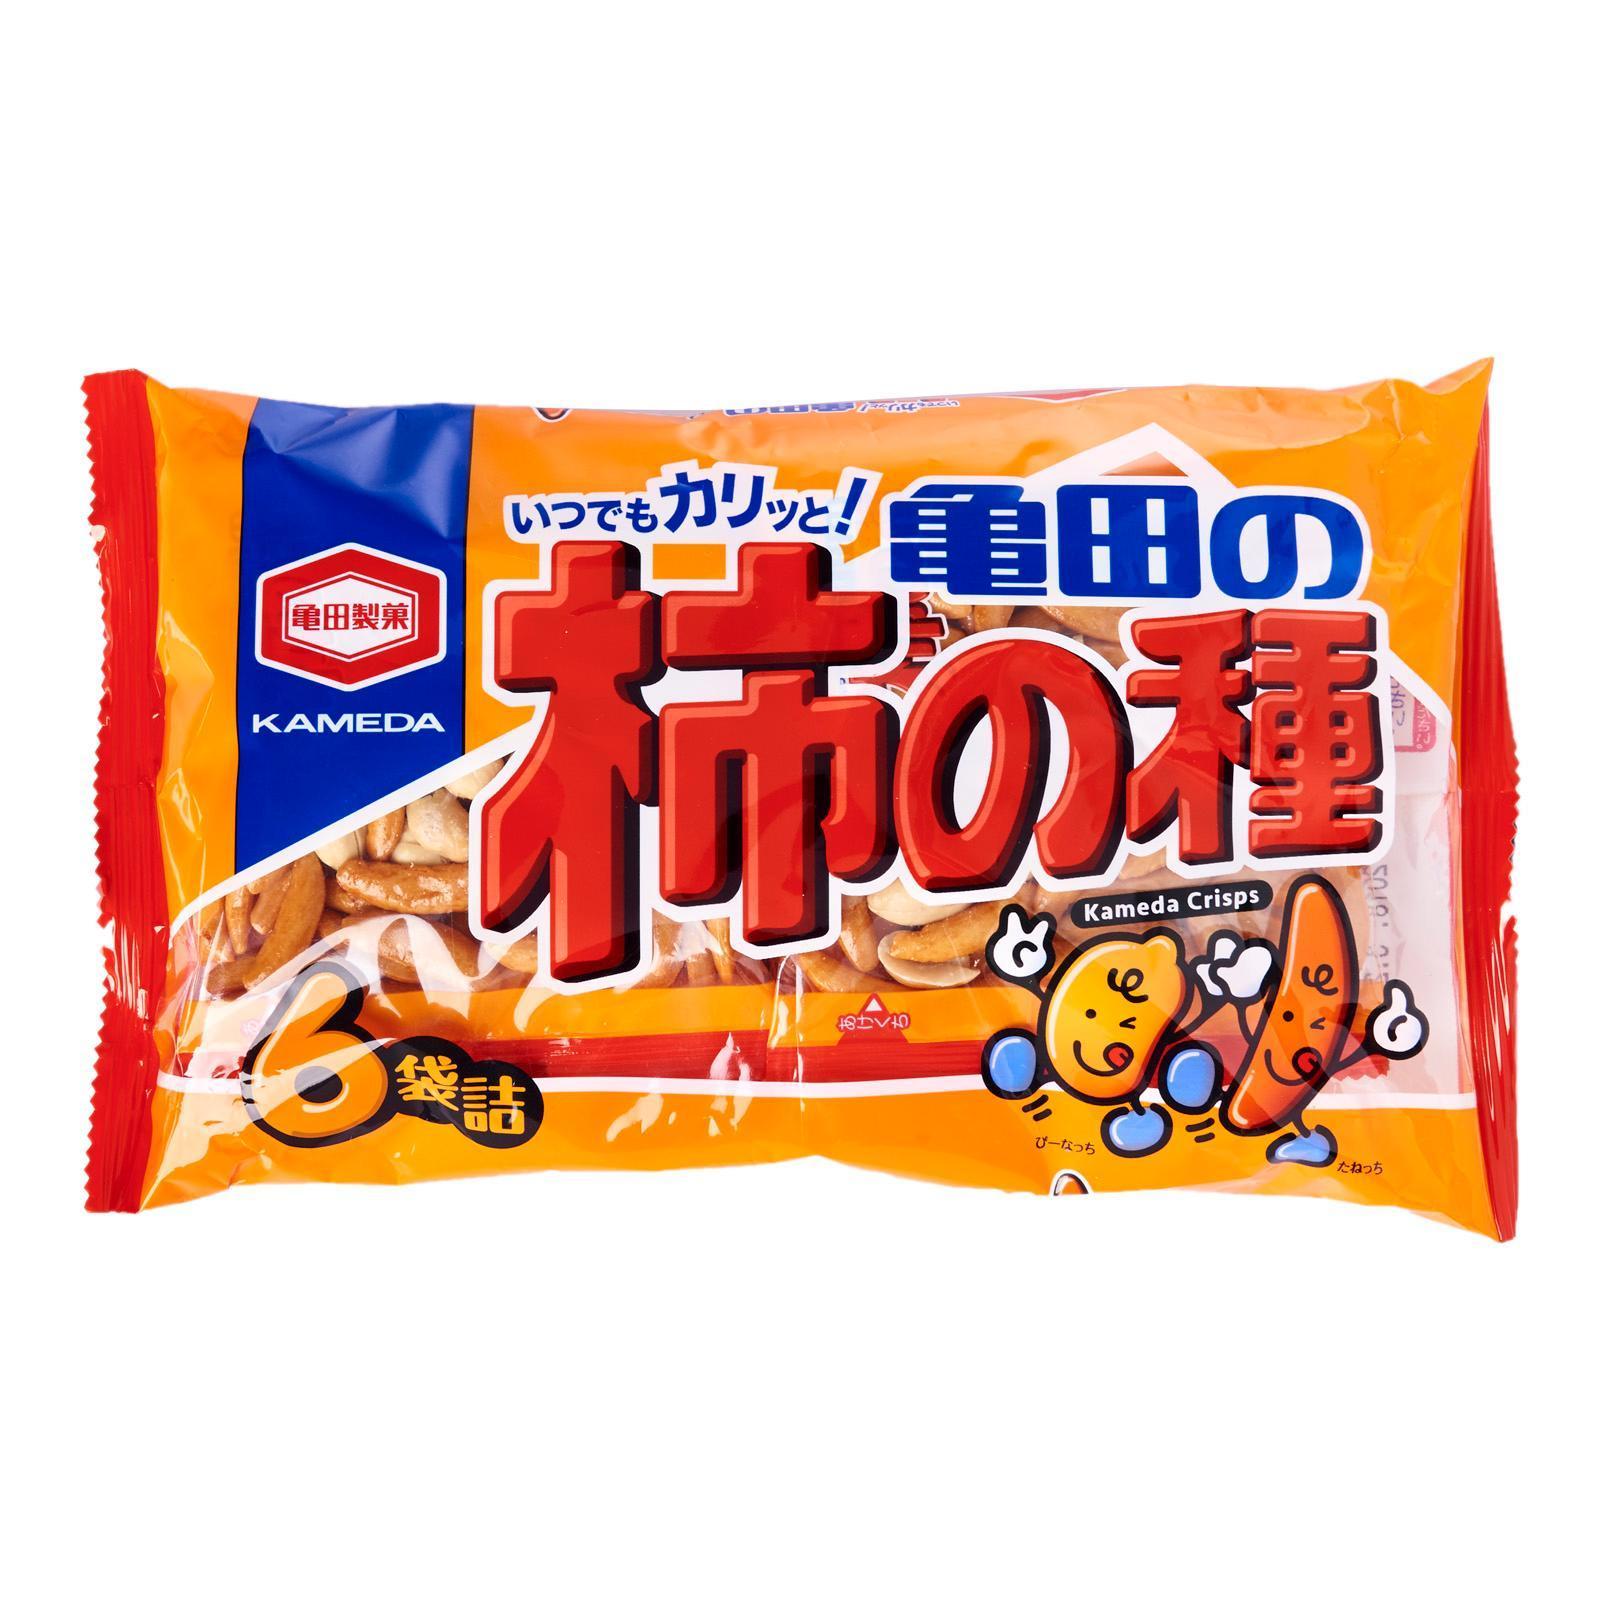 Kameda Original Kaki Seed Snack